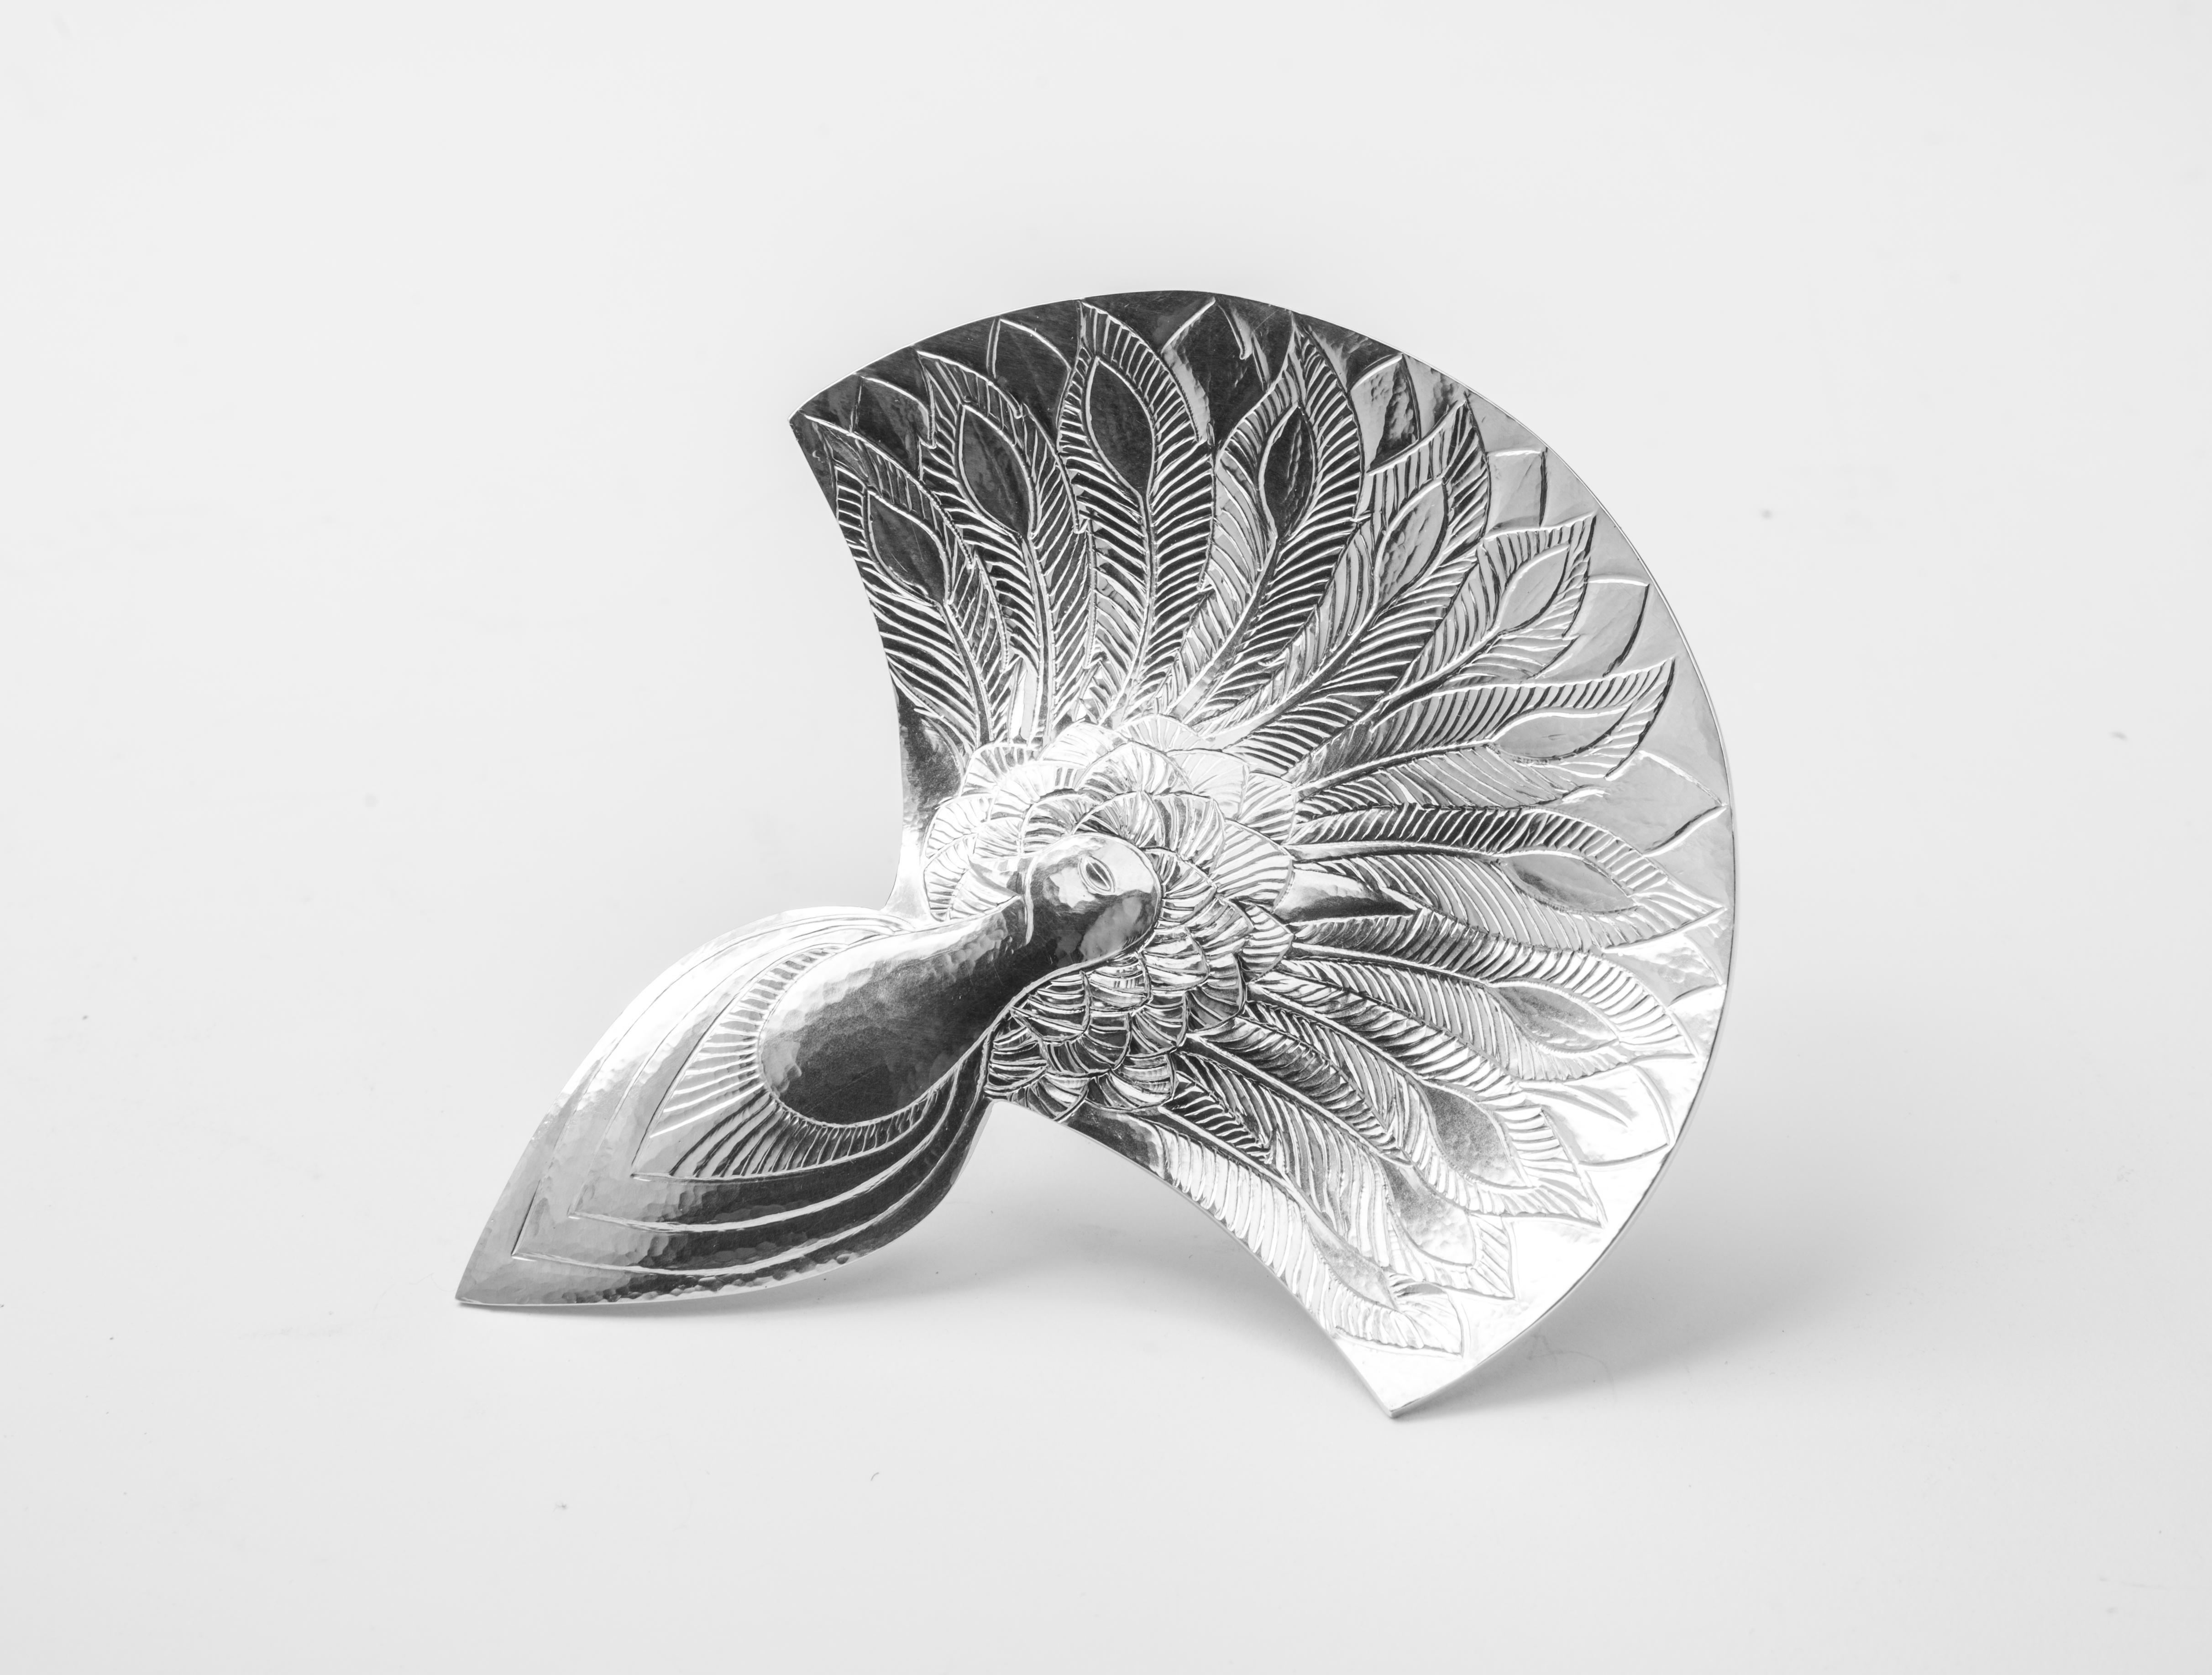 Peacock Spoon